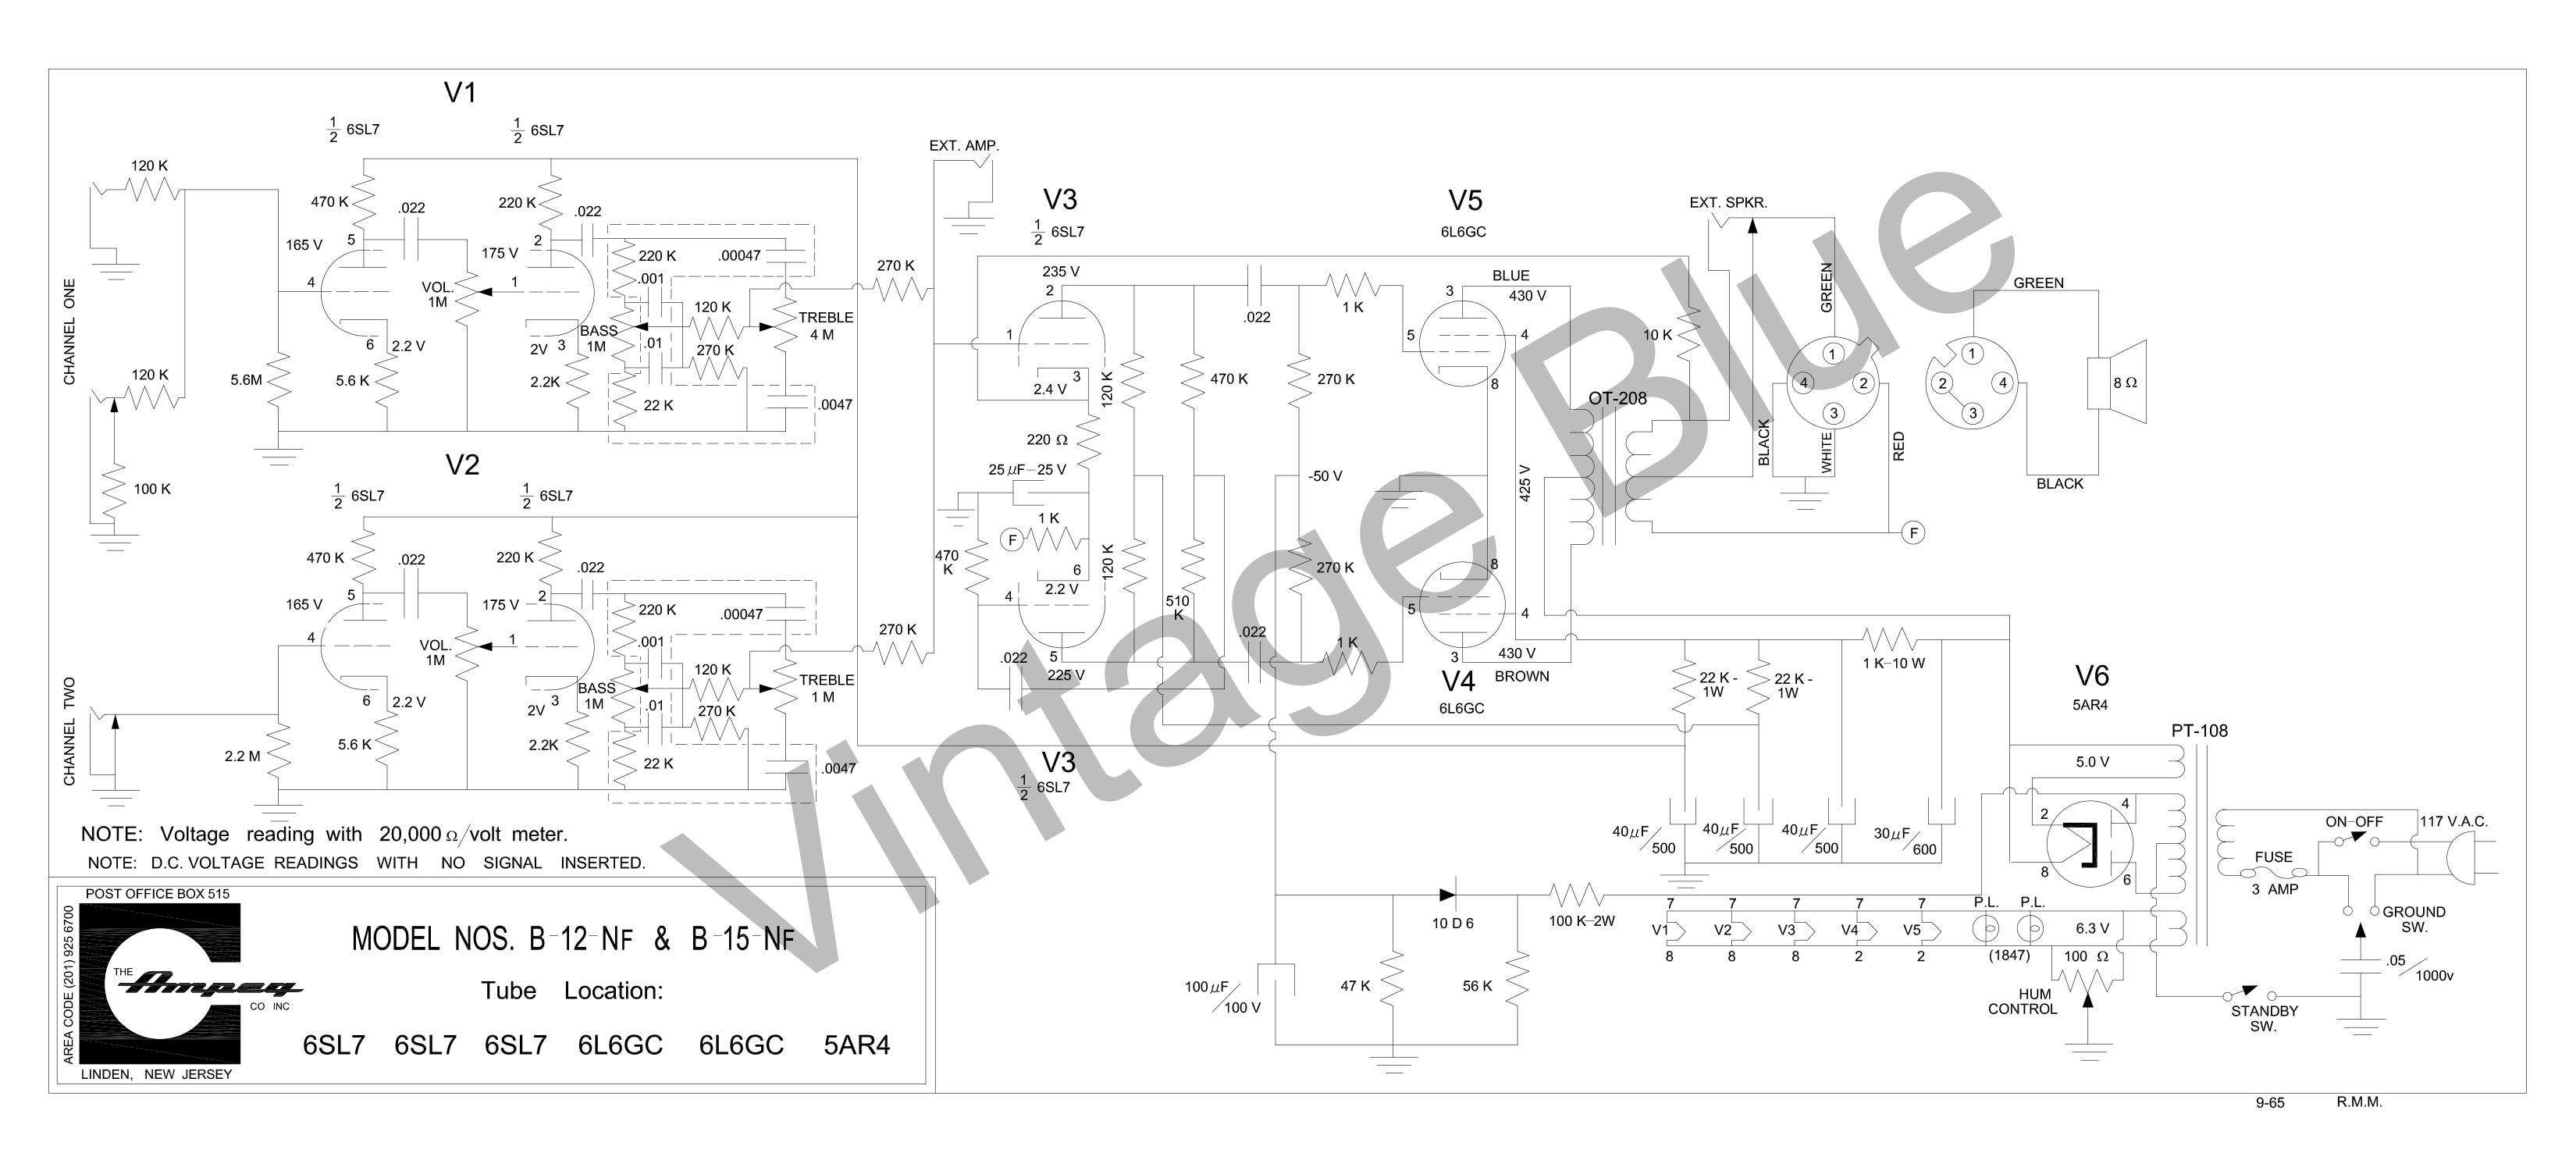 Oliver Tractor Battery Wiring Diagram Honda Cr z Fuse Box Aqua Spas B15nf  Schematic 9 65